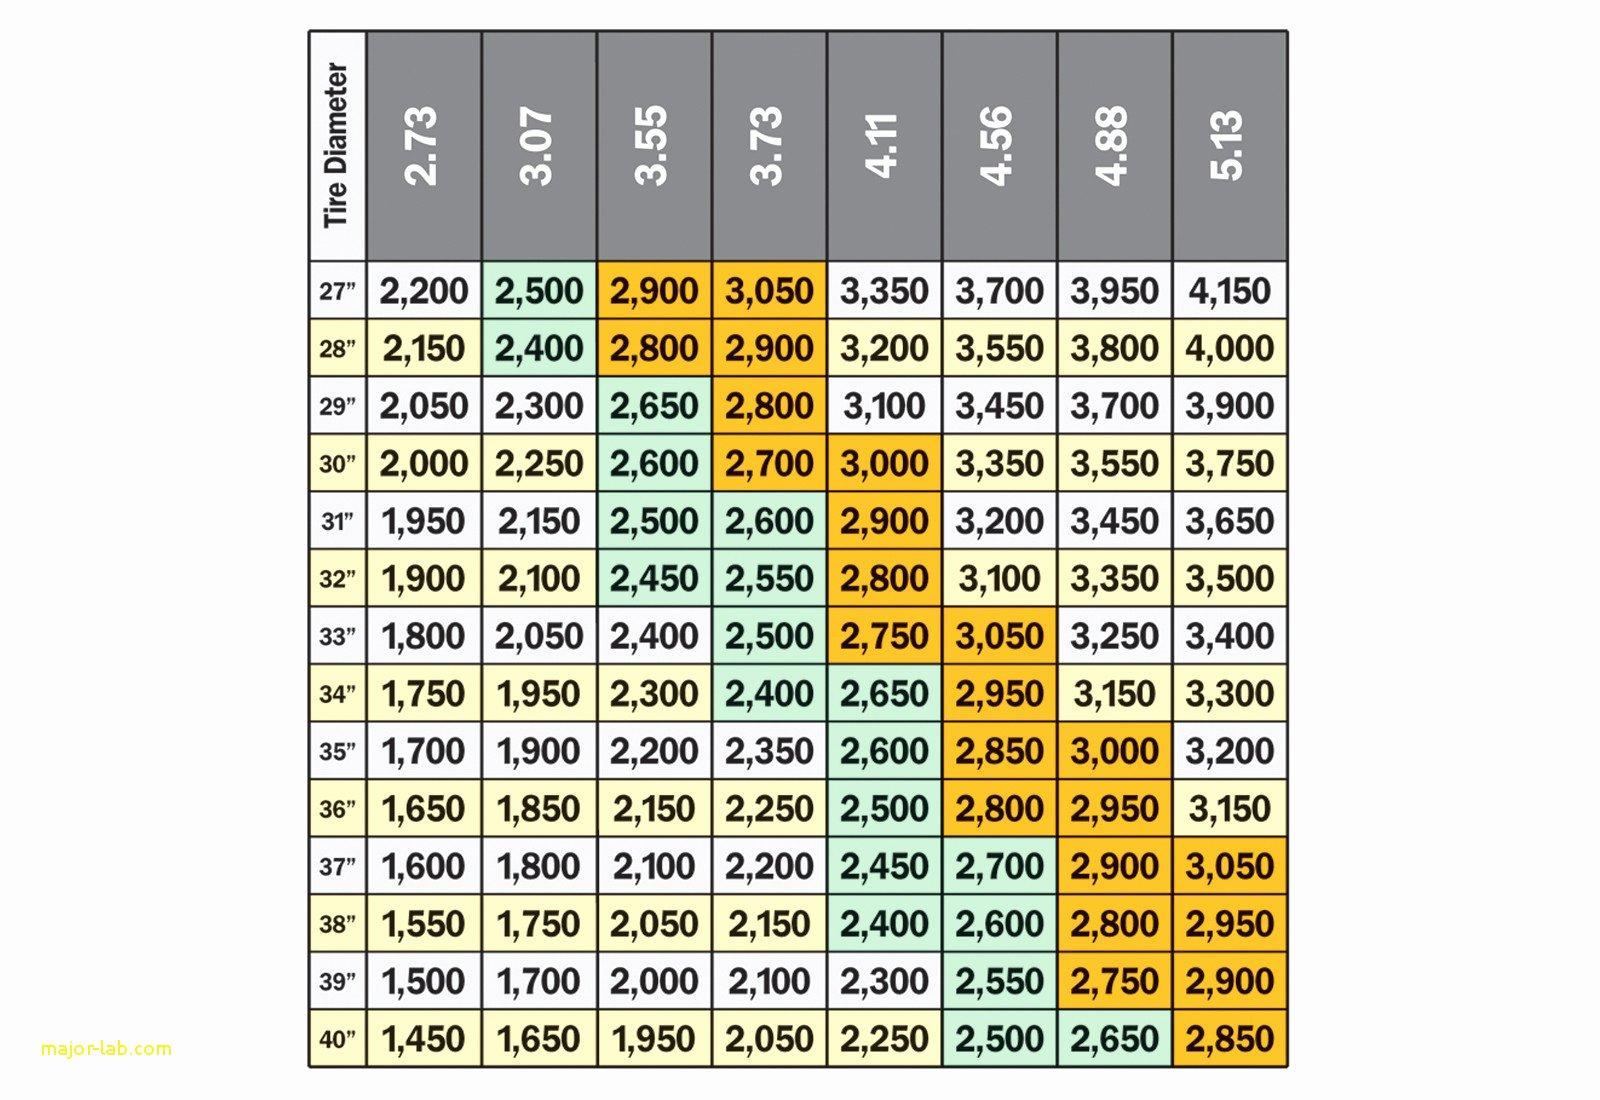 Tire Size Comparison Chart Template Inspirational Tire Size Parison Chart Template